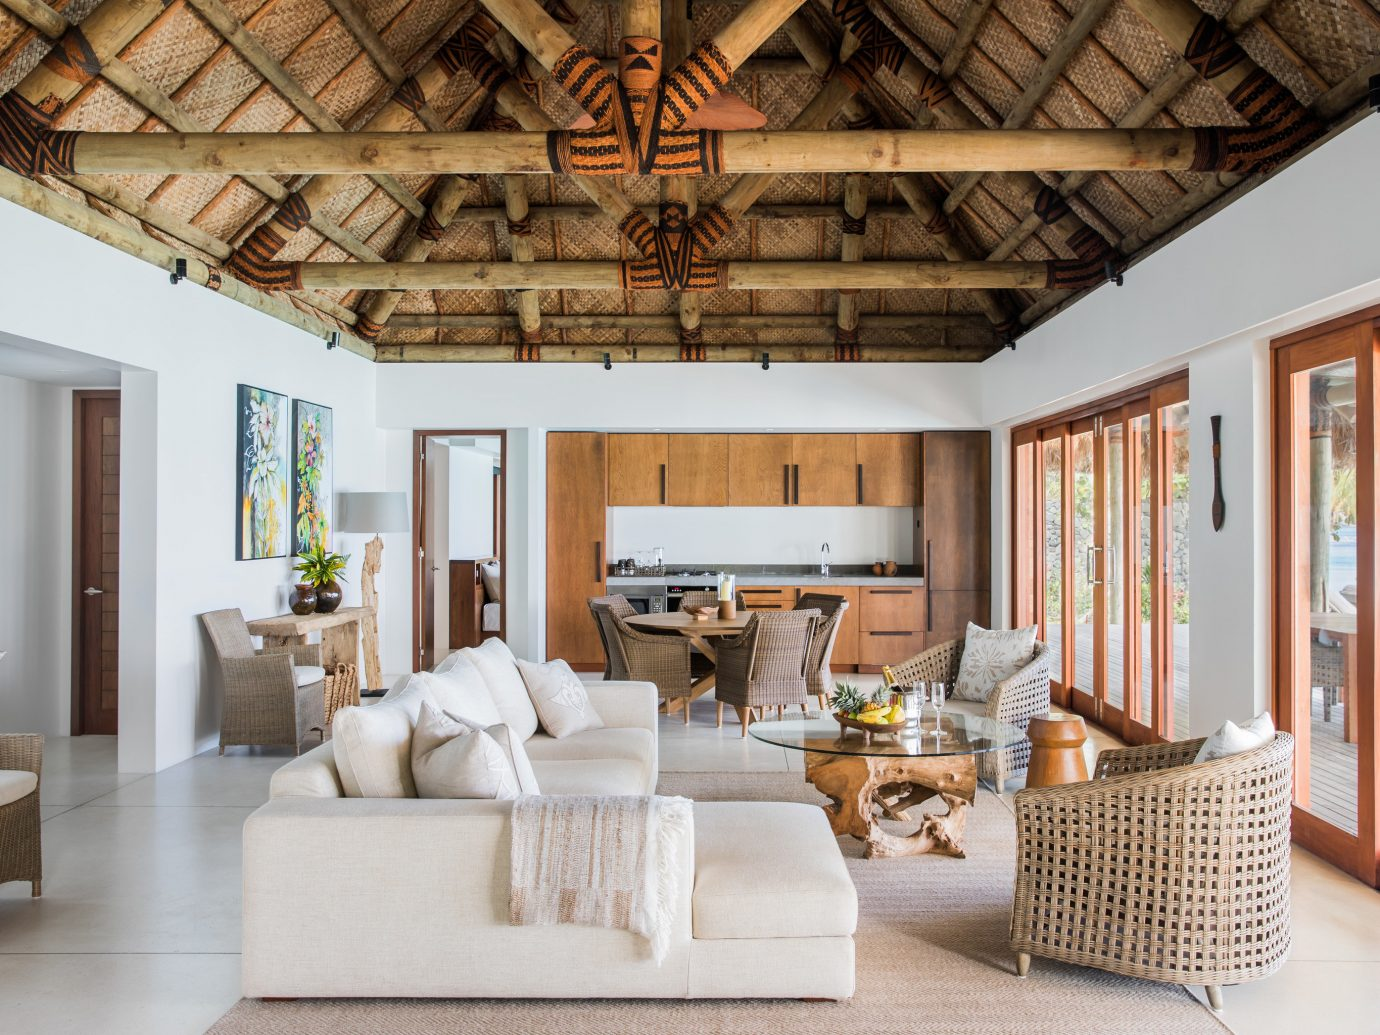 All-Inclusive Resorts Hotels Luxury Travel indoor wall floor Living room ceiling living room interior design estate real estate home furniture window interior designer house daylighting